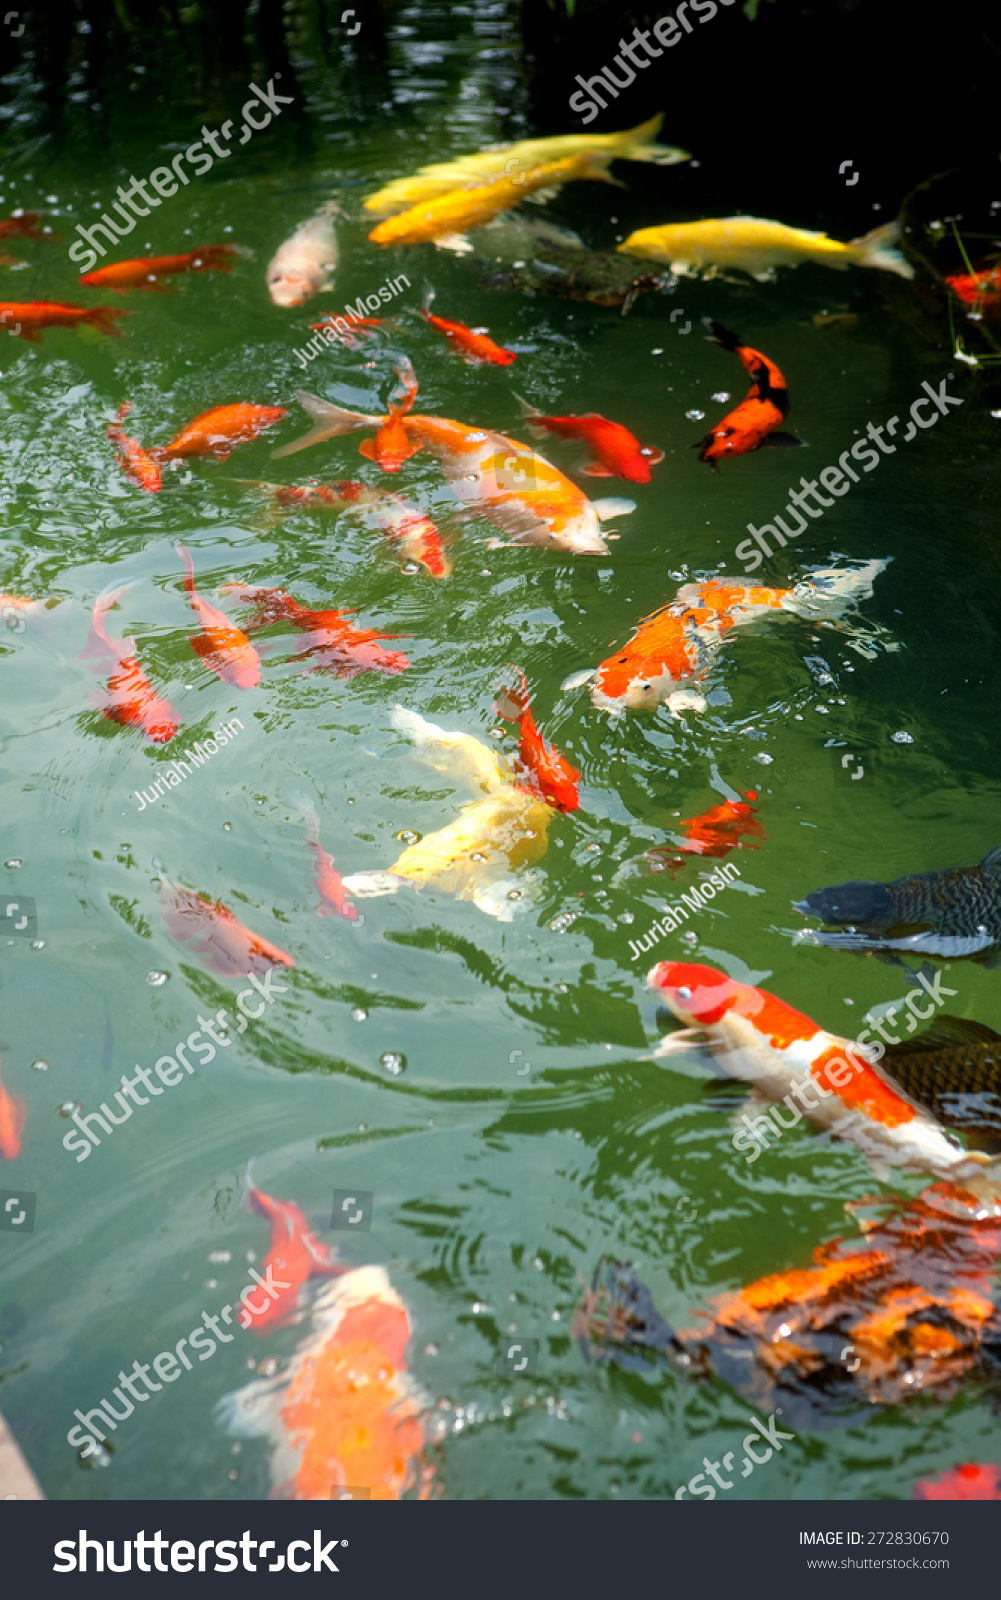 Beautiful ornamental koi fish swimming in pond stock for Beautiful koi fish